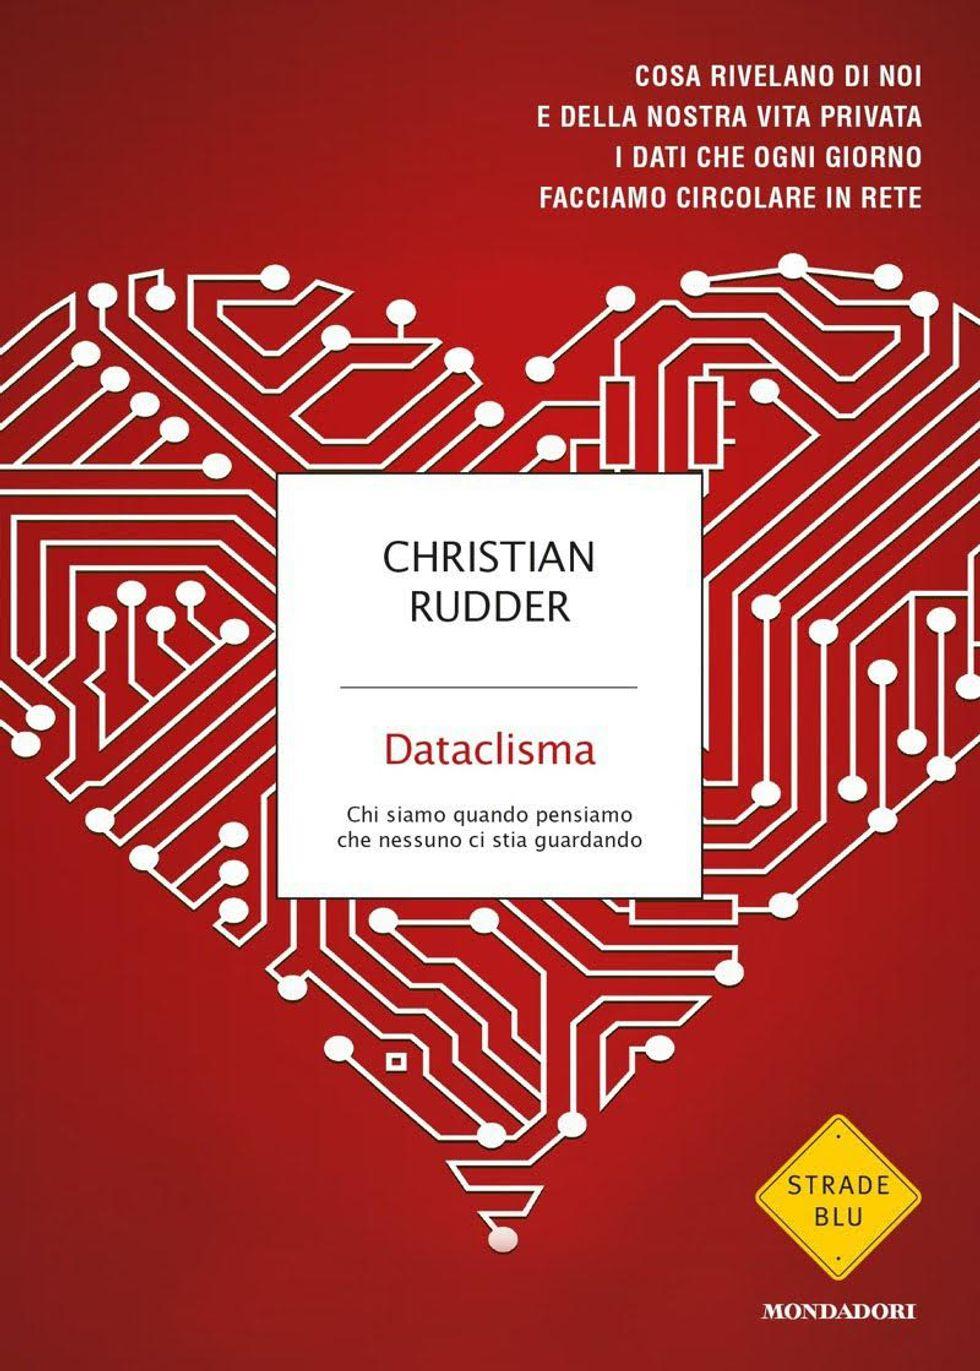 Christian Rudder, il futuro è un Dataclisma